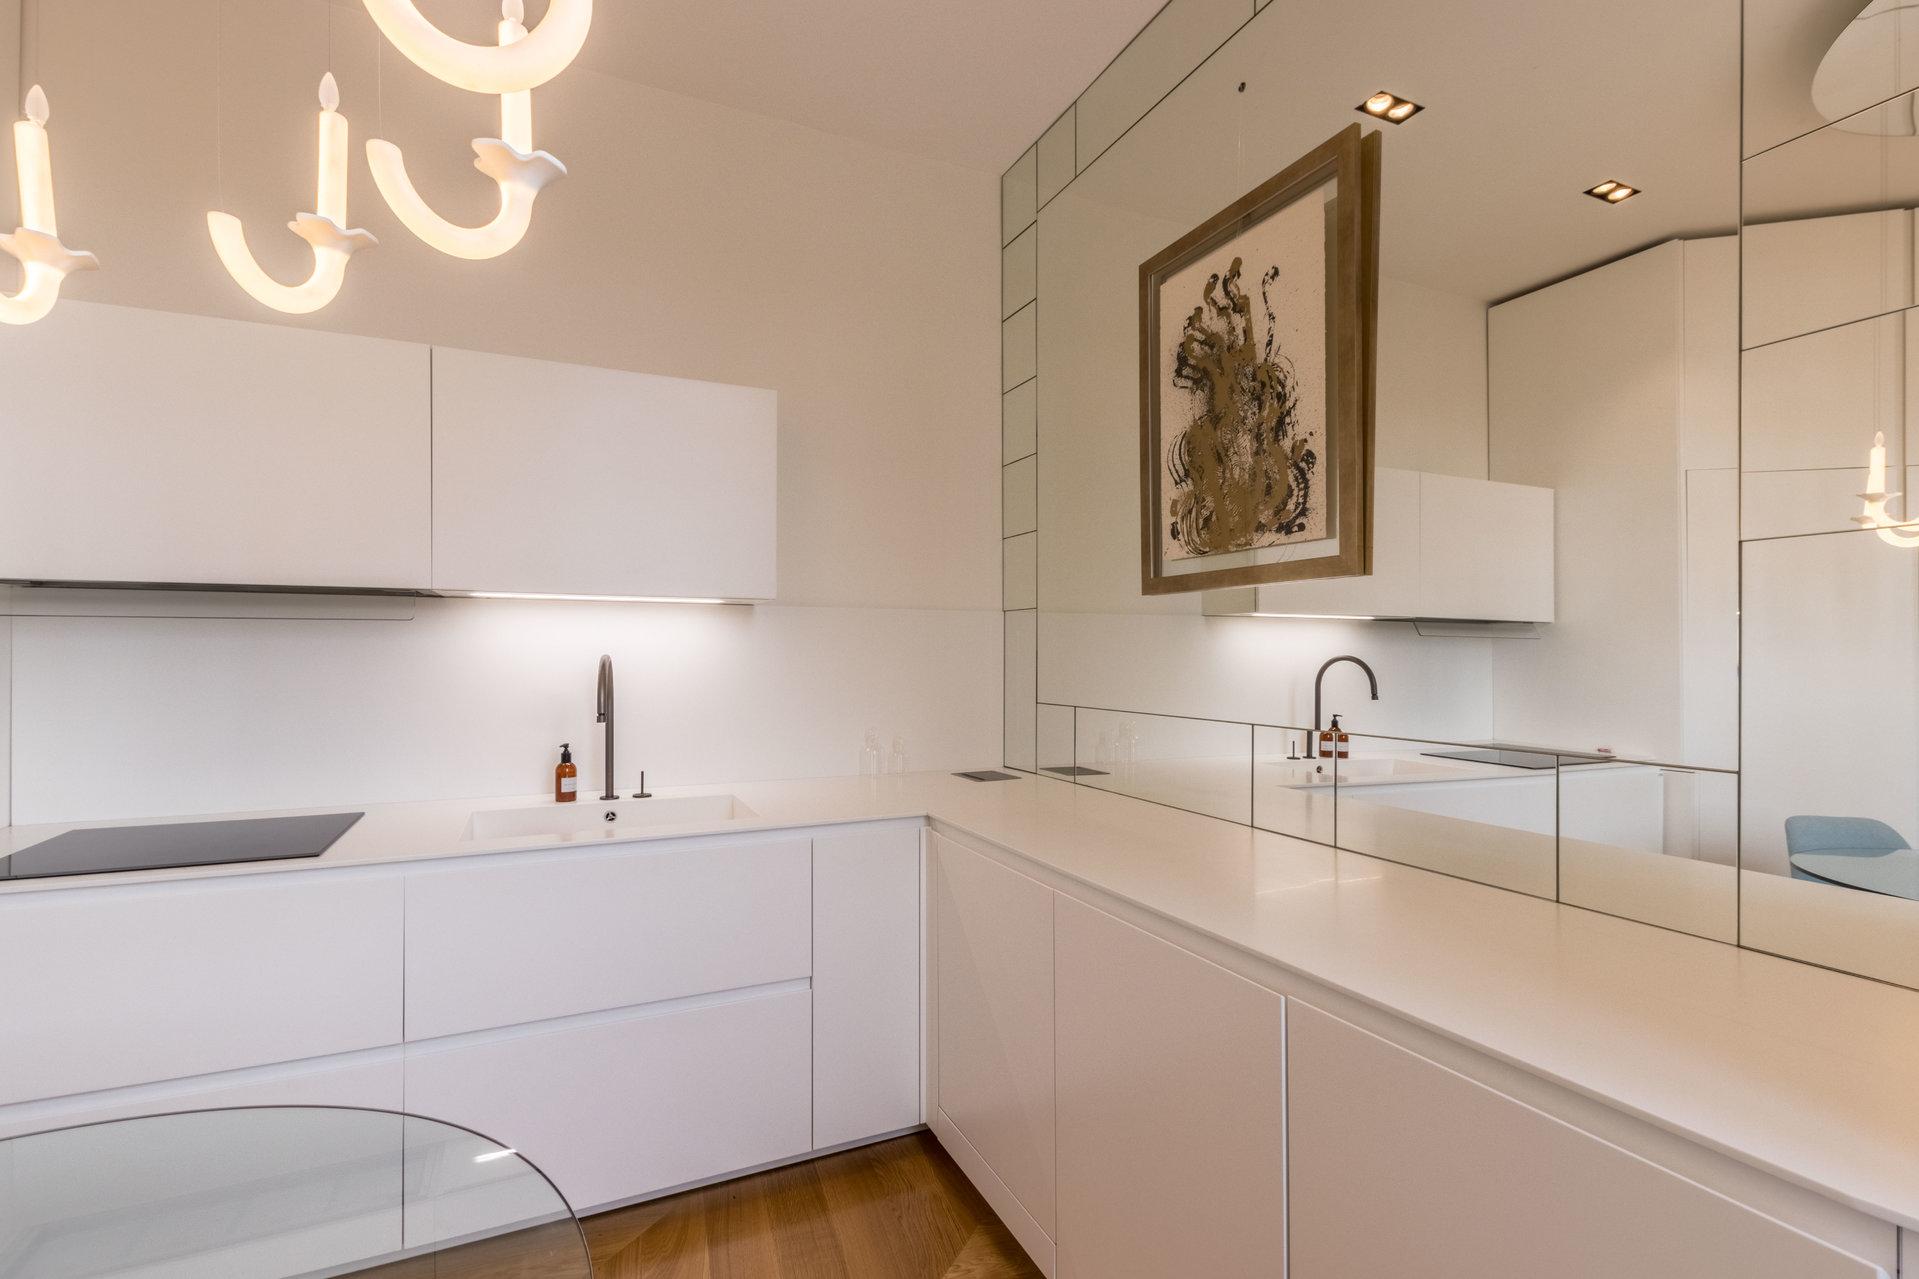 Luxurious 3-room apartment, upscale renovation, on Garibaldi square with balcony